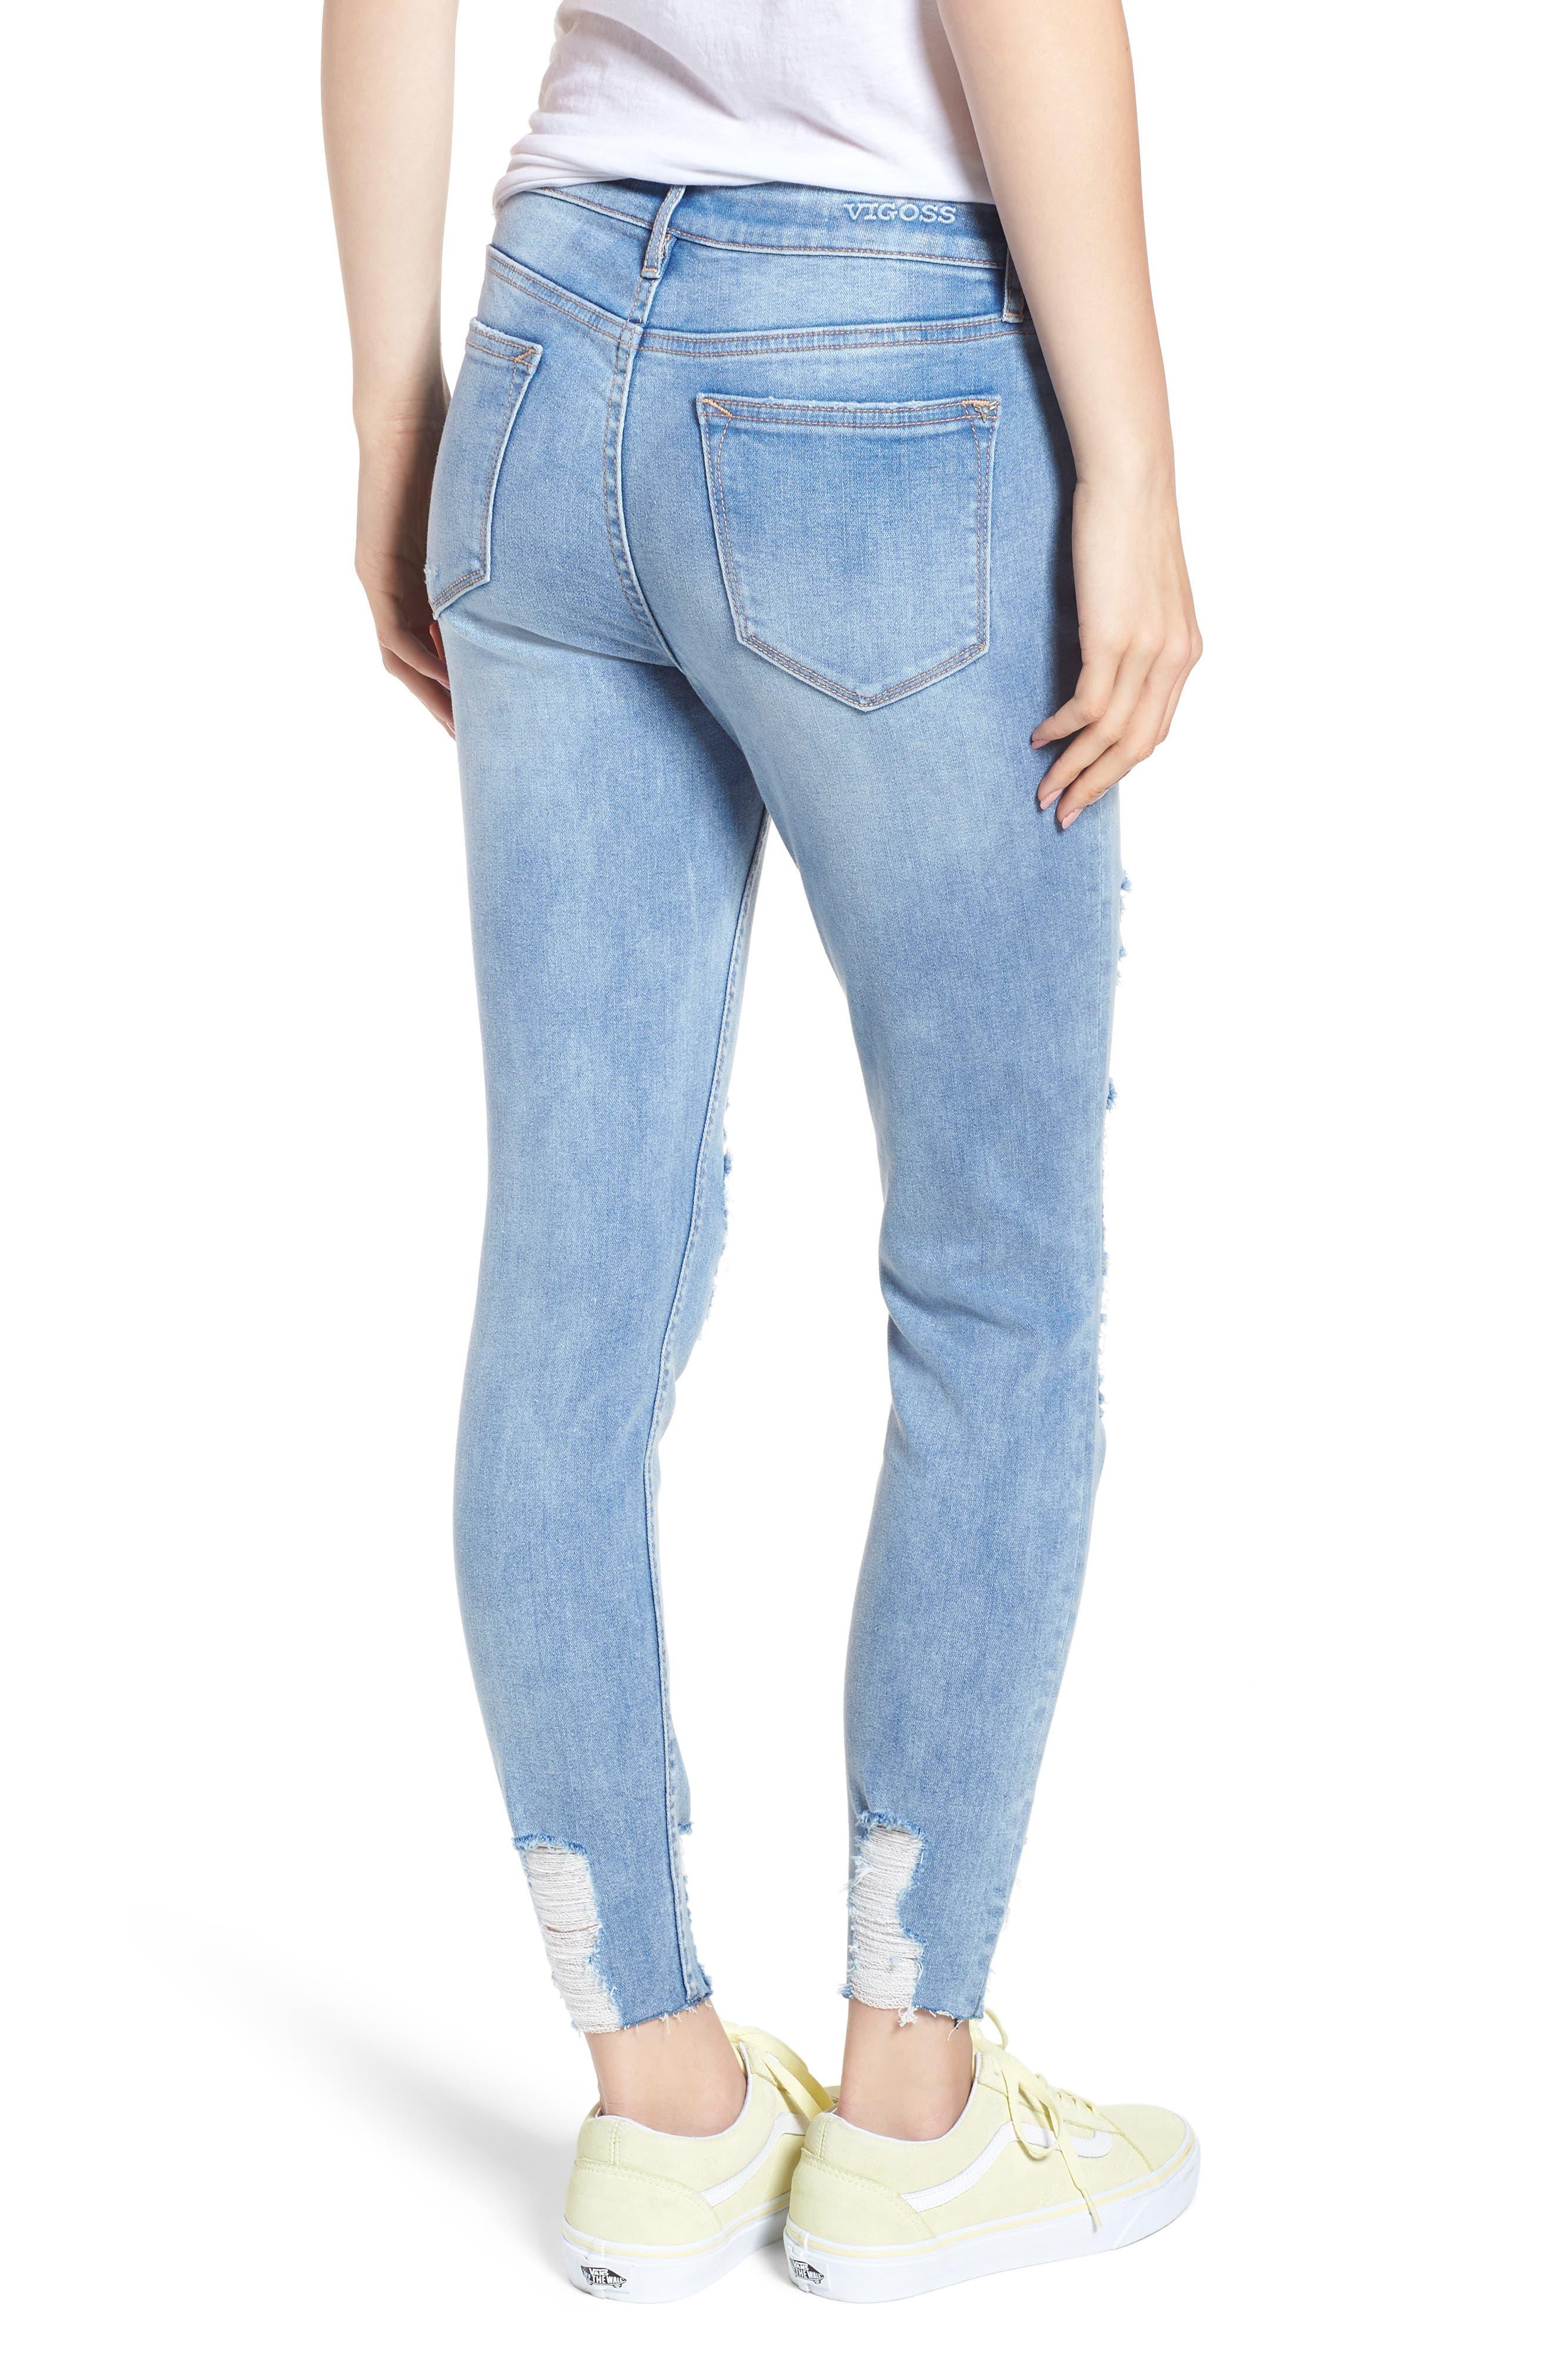 Marley Distressed Crop Skinny Jeans,                             Alternate thumbnail 2, color,                             Light Medium Wash